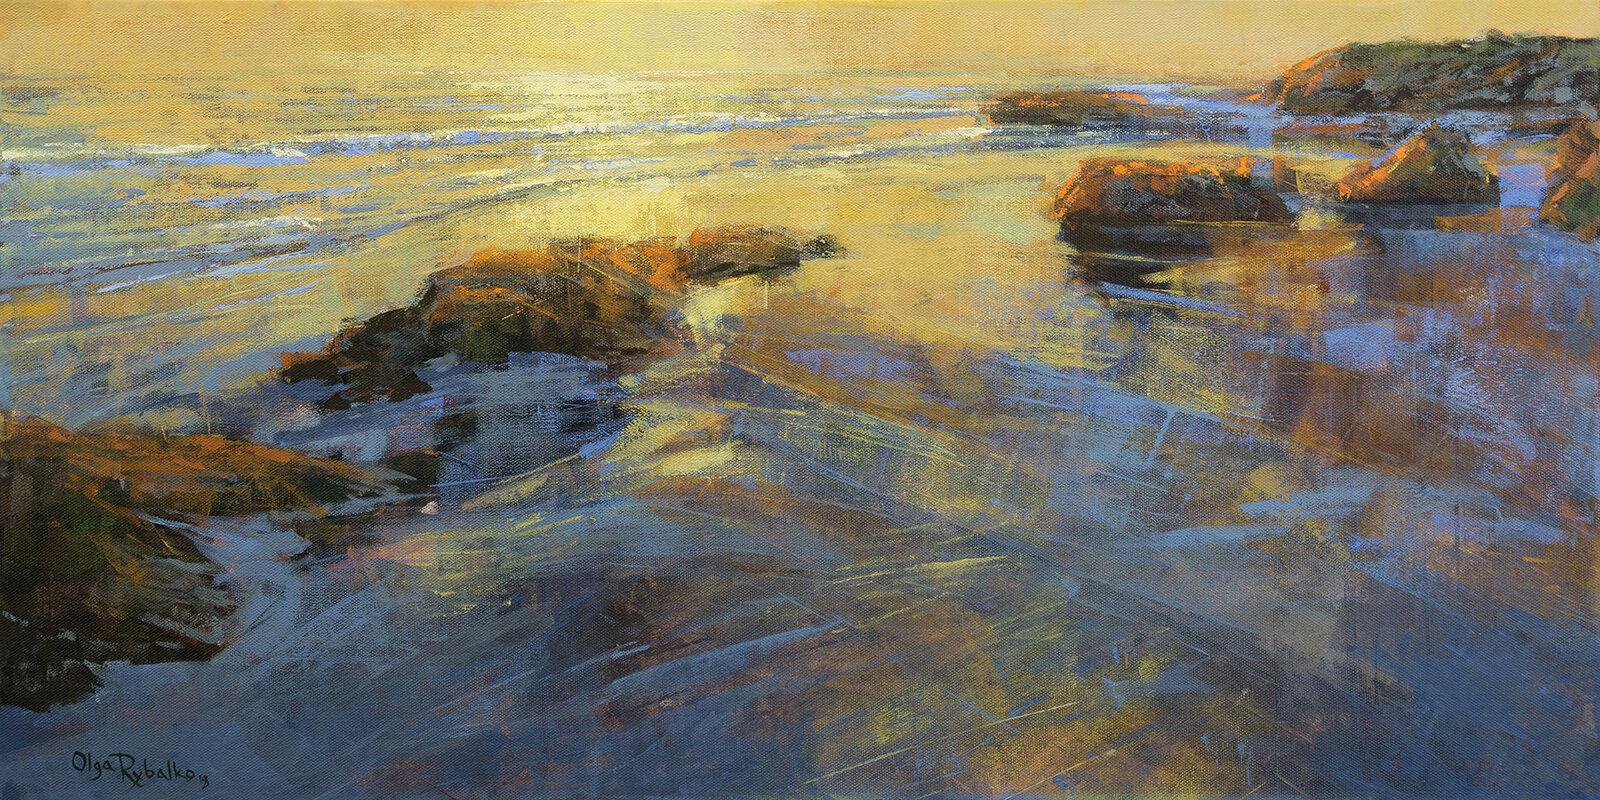 olga+rybalko+art+-+pacific+rim+-+landscape+painting-16.jpg